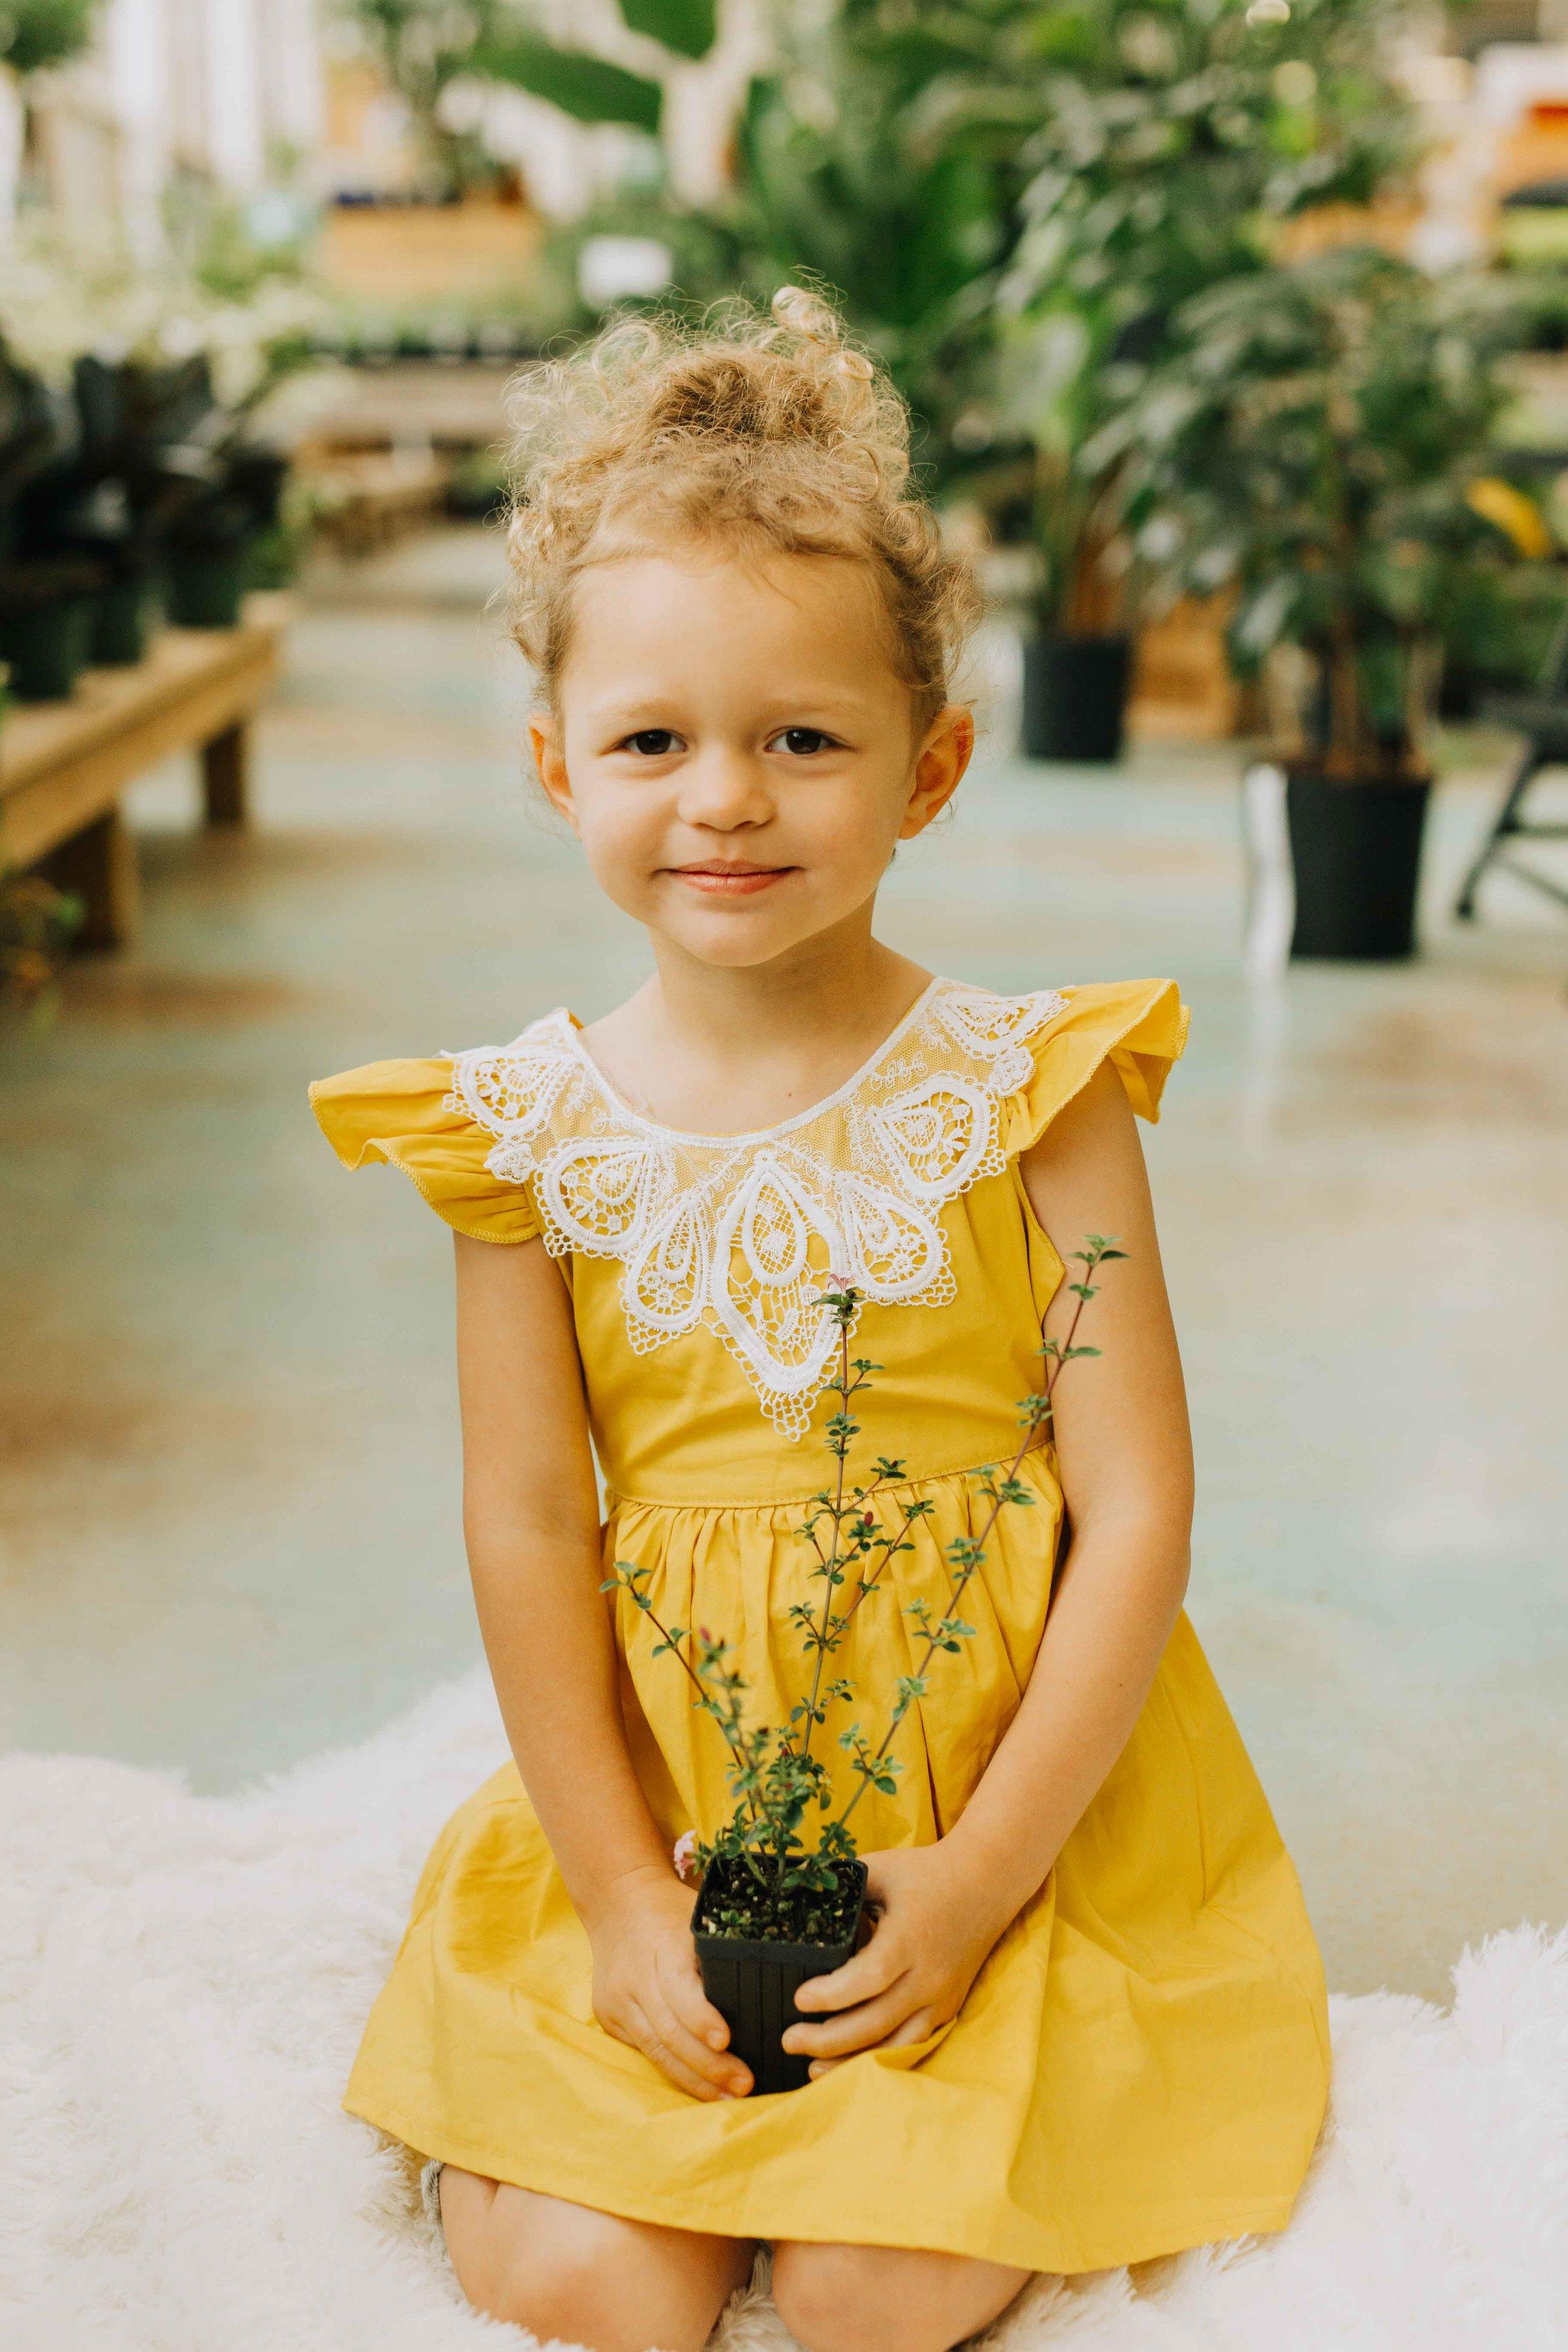 Merrifield-garden-greenhouse-indoor-Jacqueline-Waters-Photography-Red-dress-family- (151).jpg